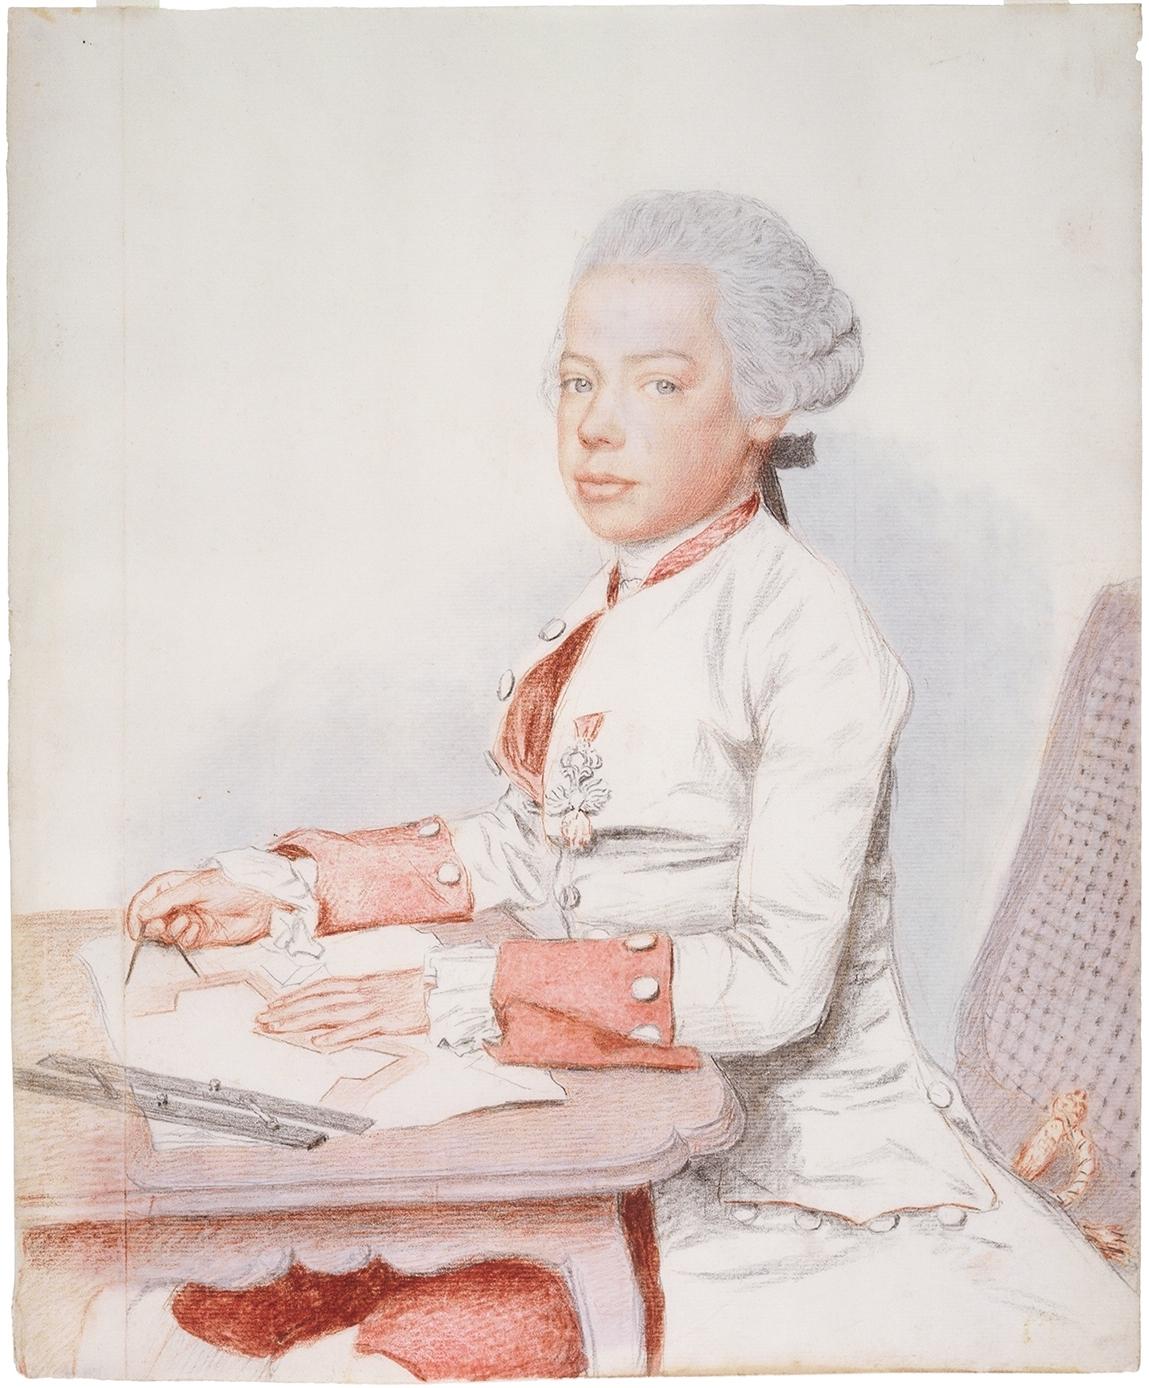 Výsledek obrázku pro joseph II by liotard